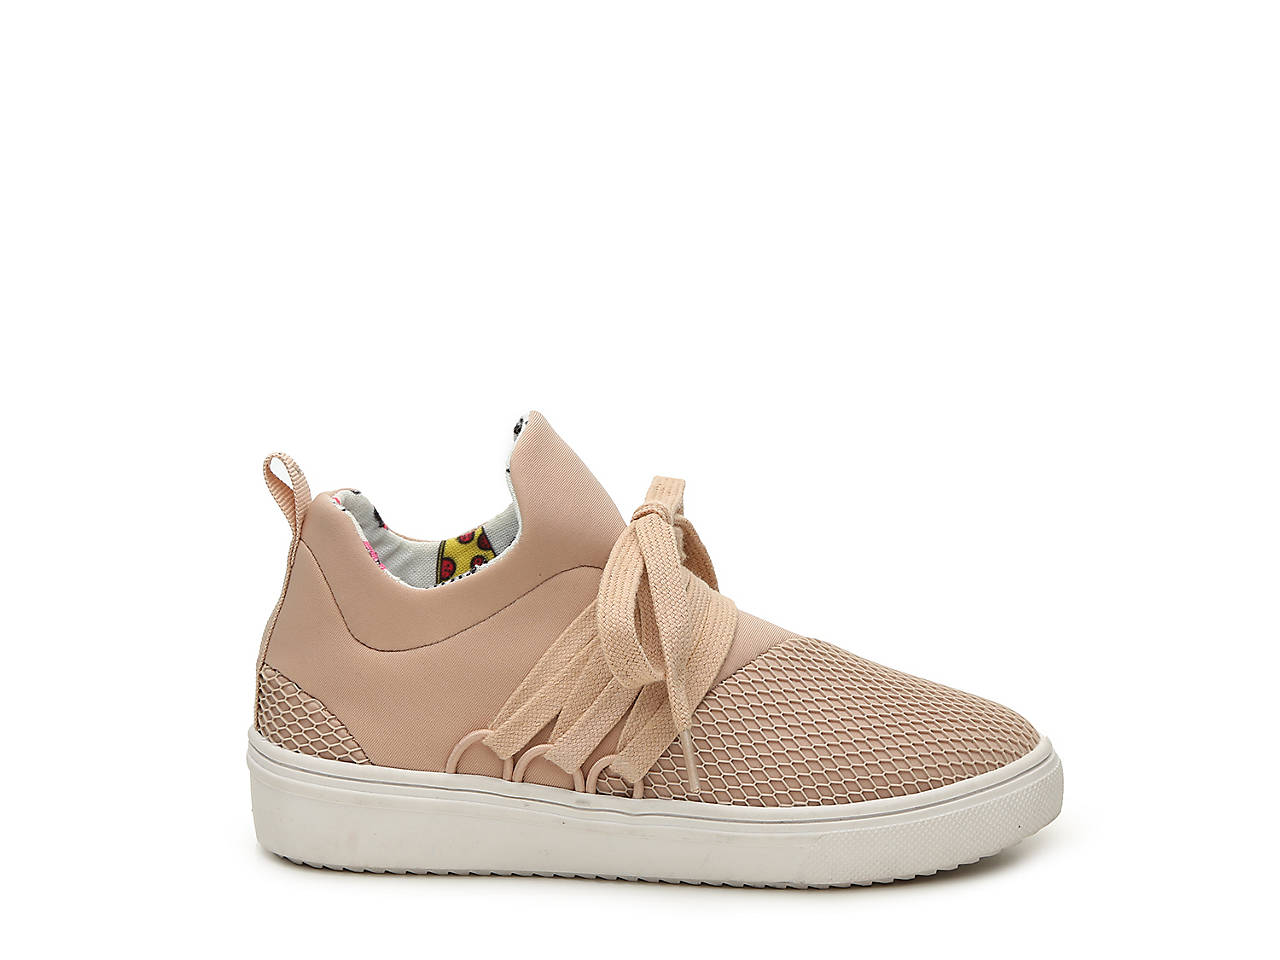 990408546cd Steve Madden Lancer Toddler   Youth Sneaker Kids Shoes